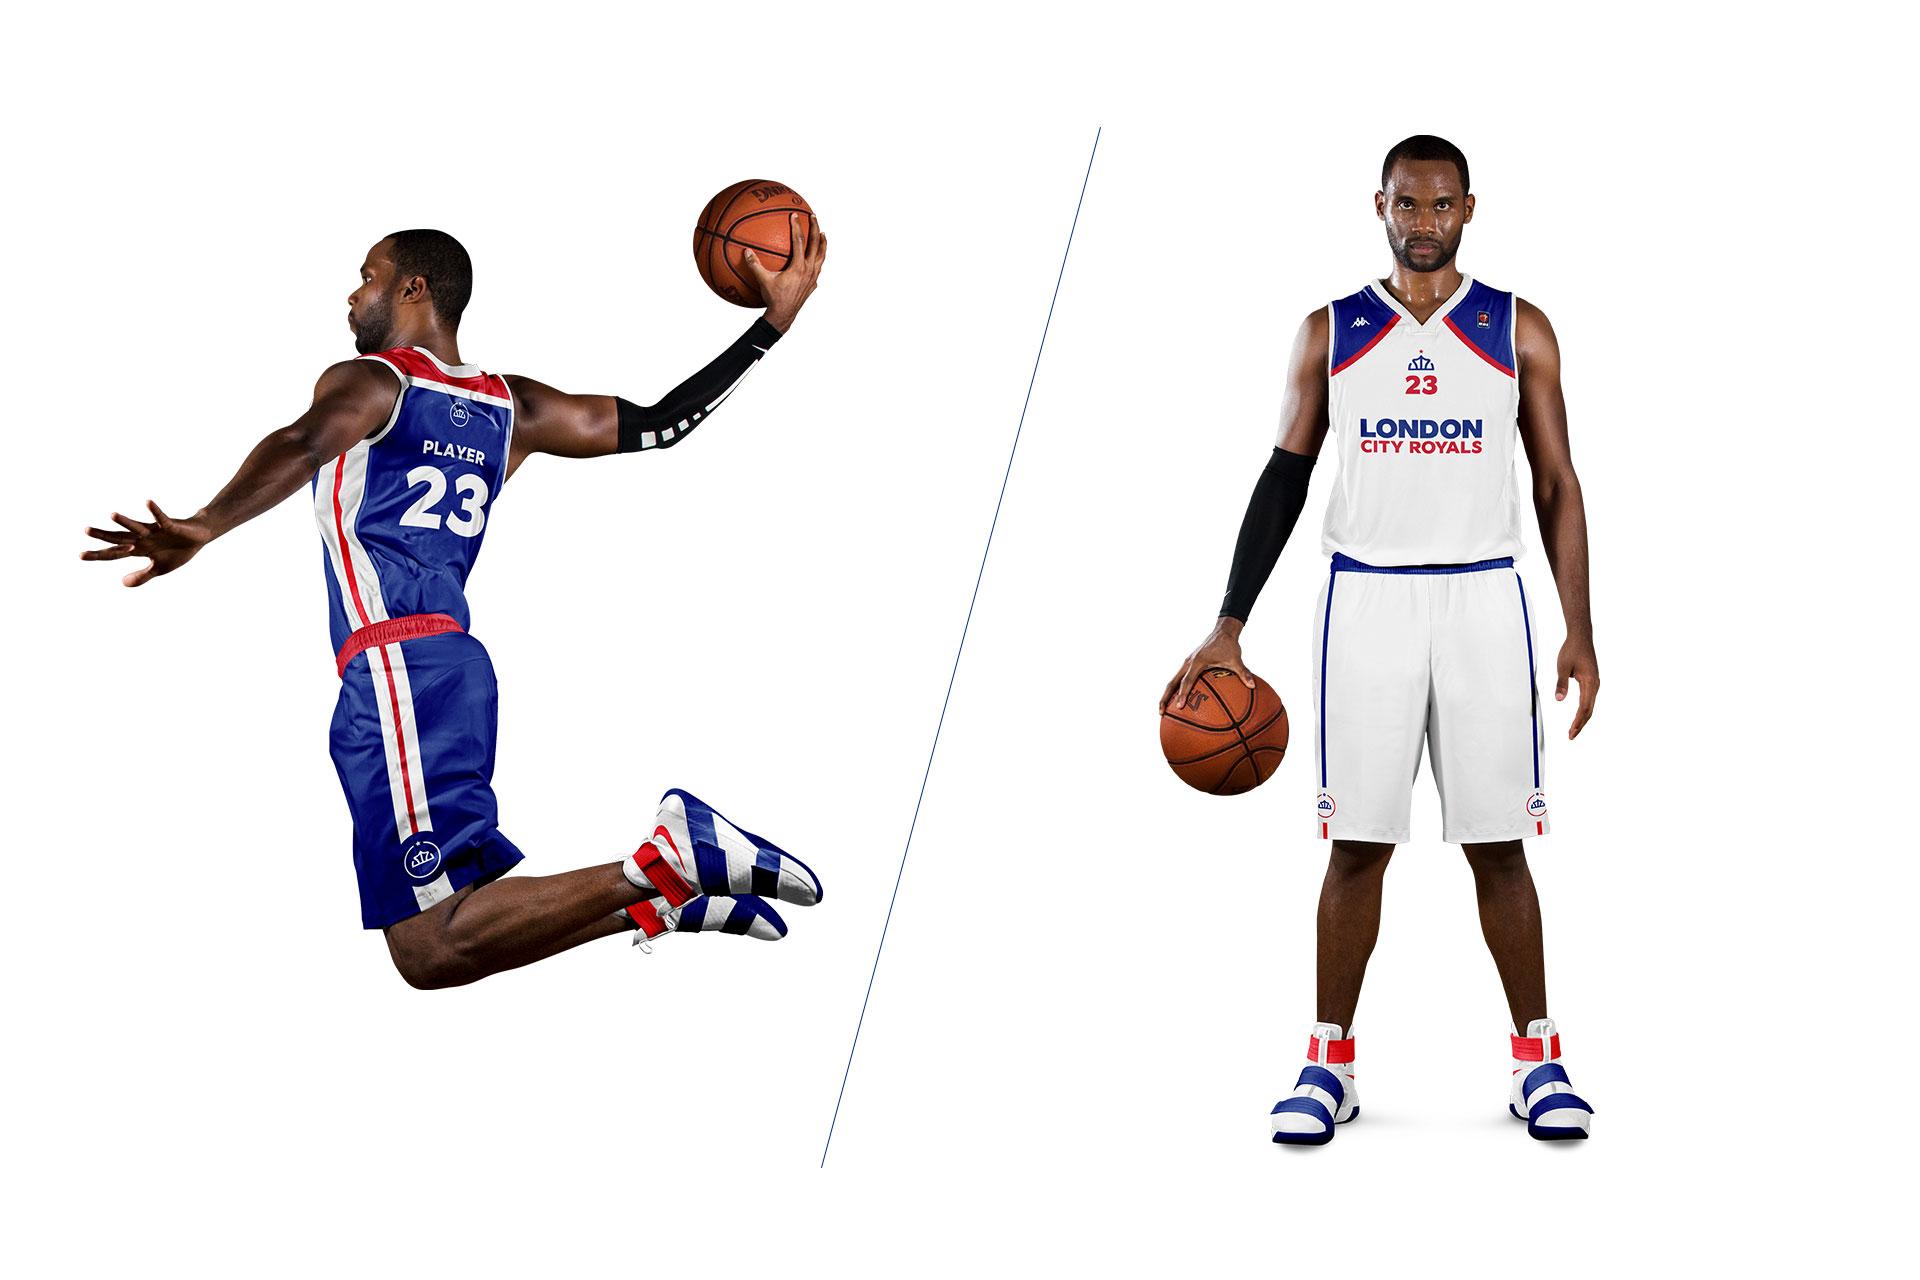 London-City-Royals-branding-basketball-jersey-kit-design-by-Orfi-Media